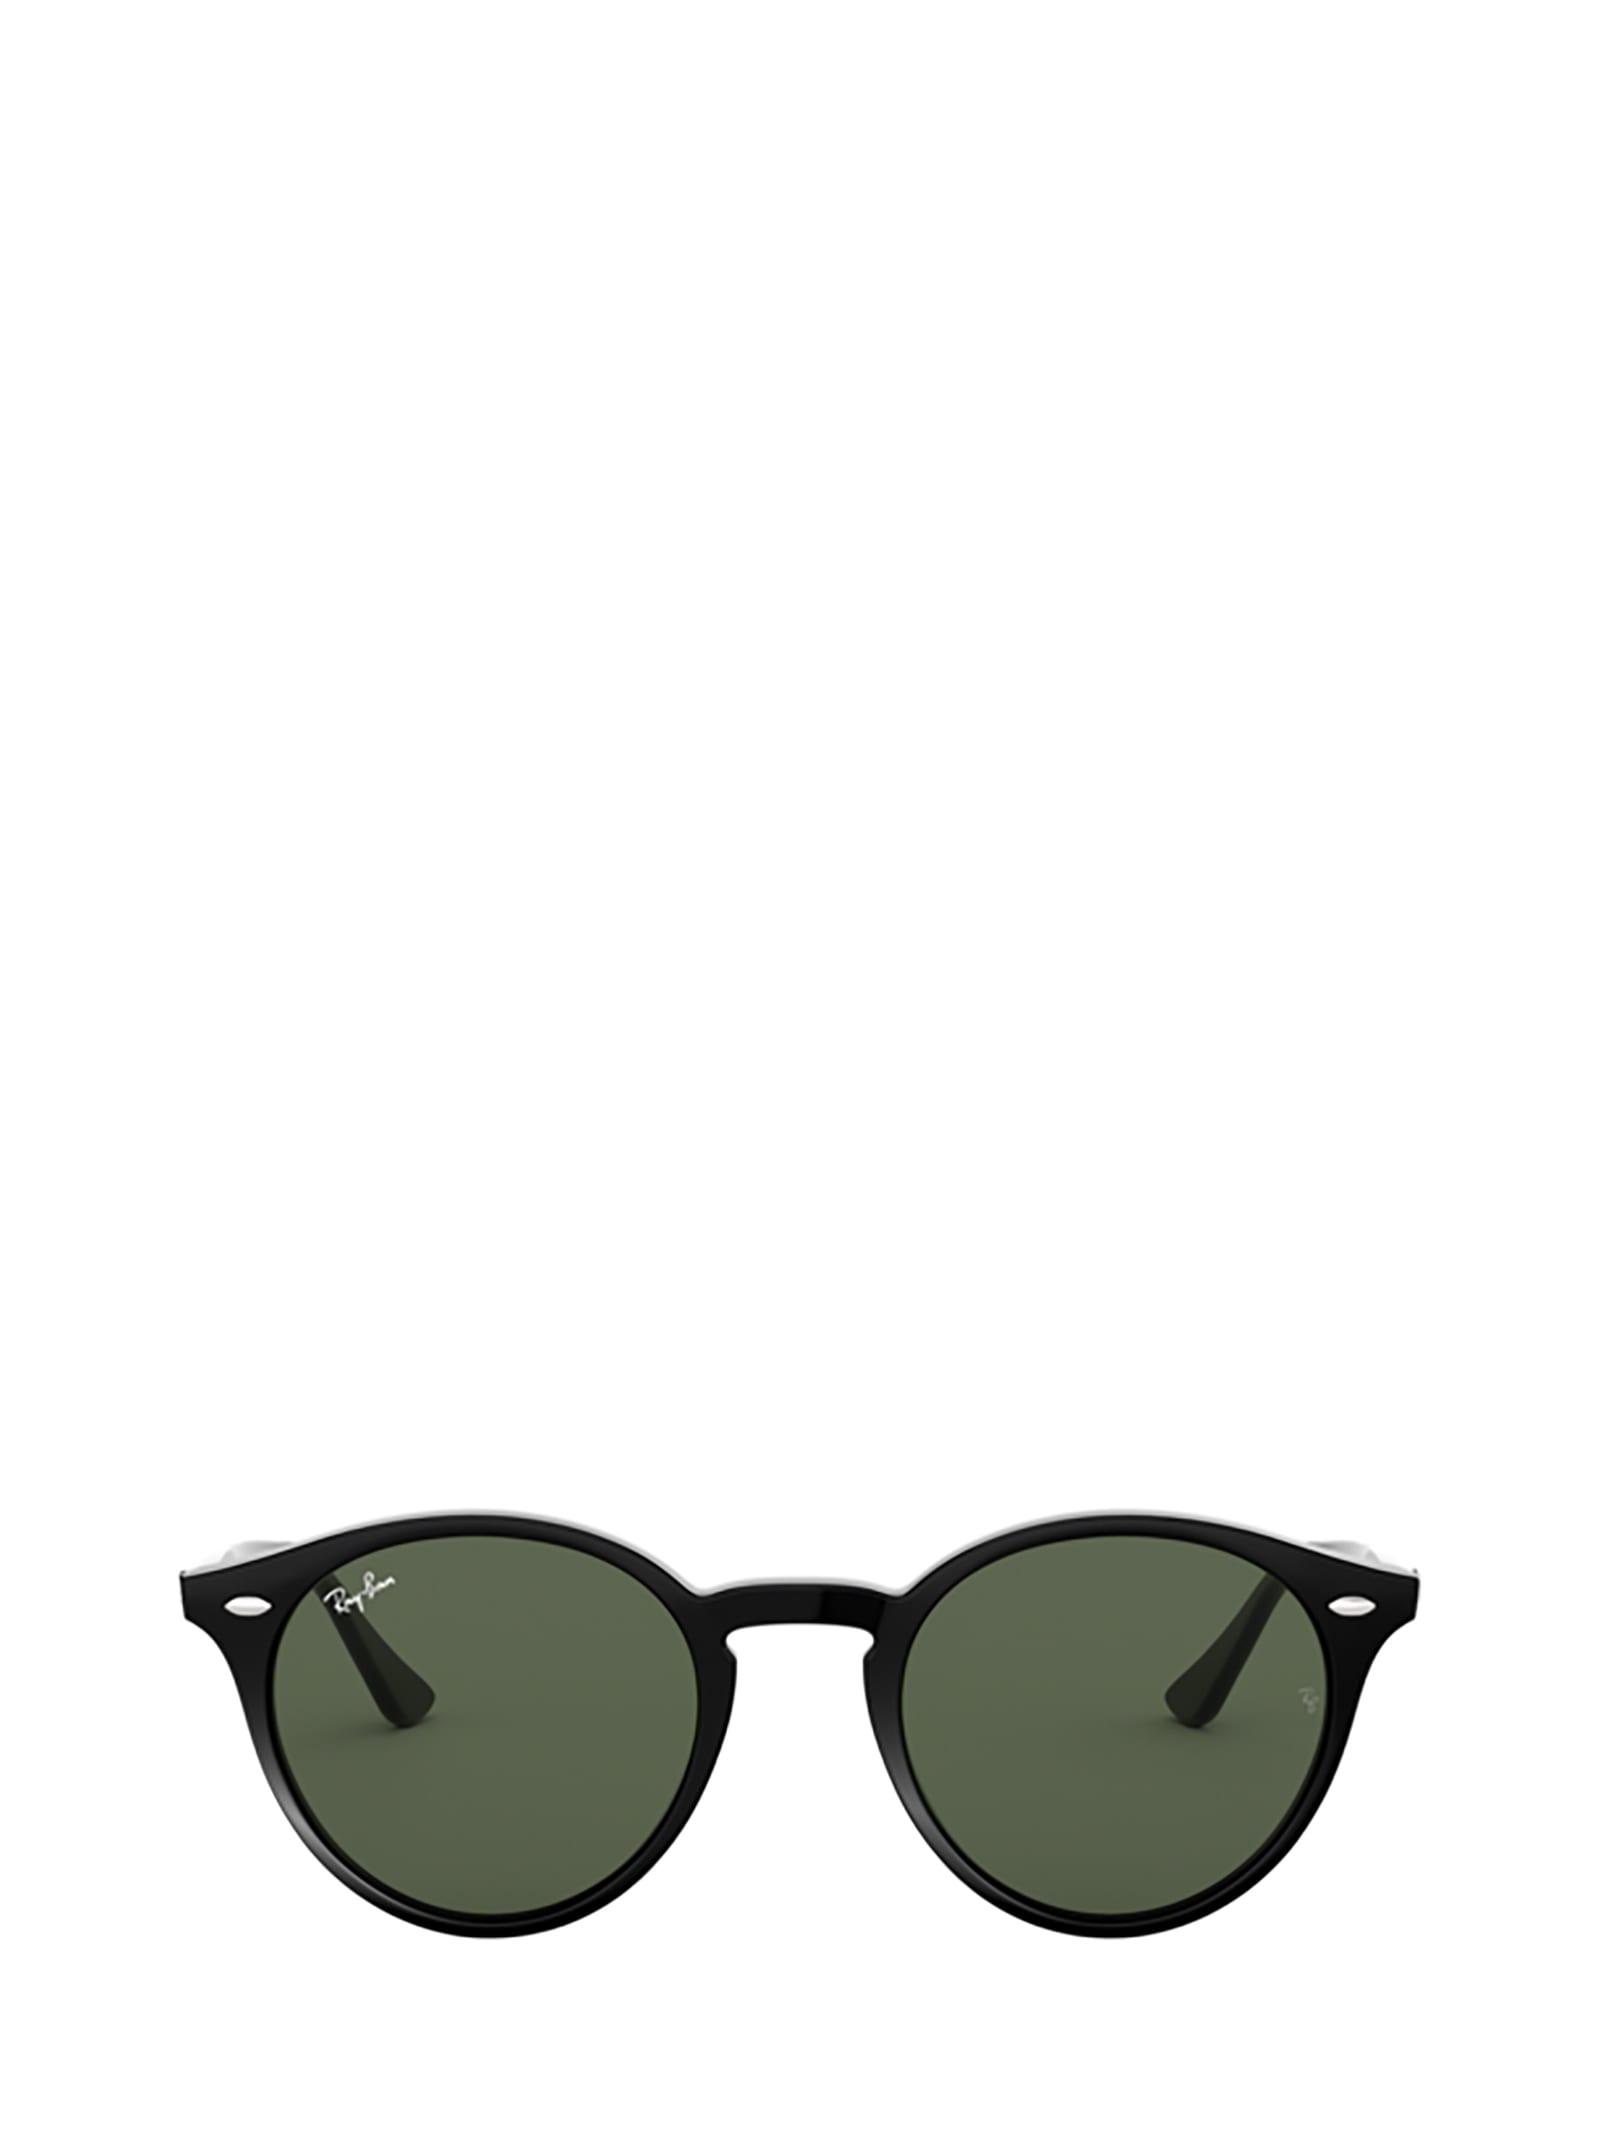 Ray-Ban Ray-ban Rb2180 Black Sunglasses